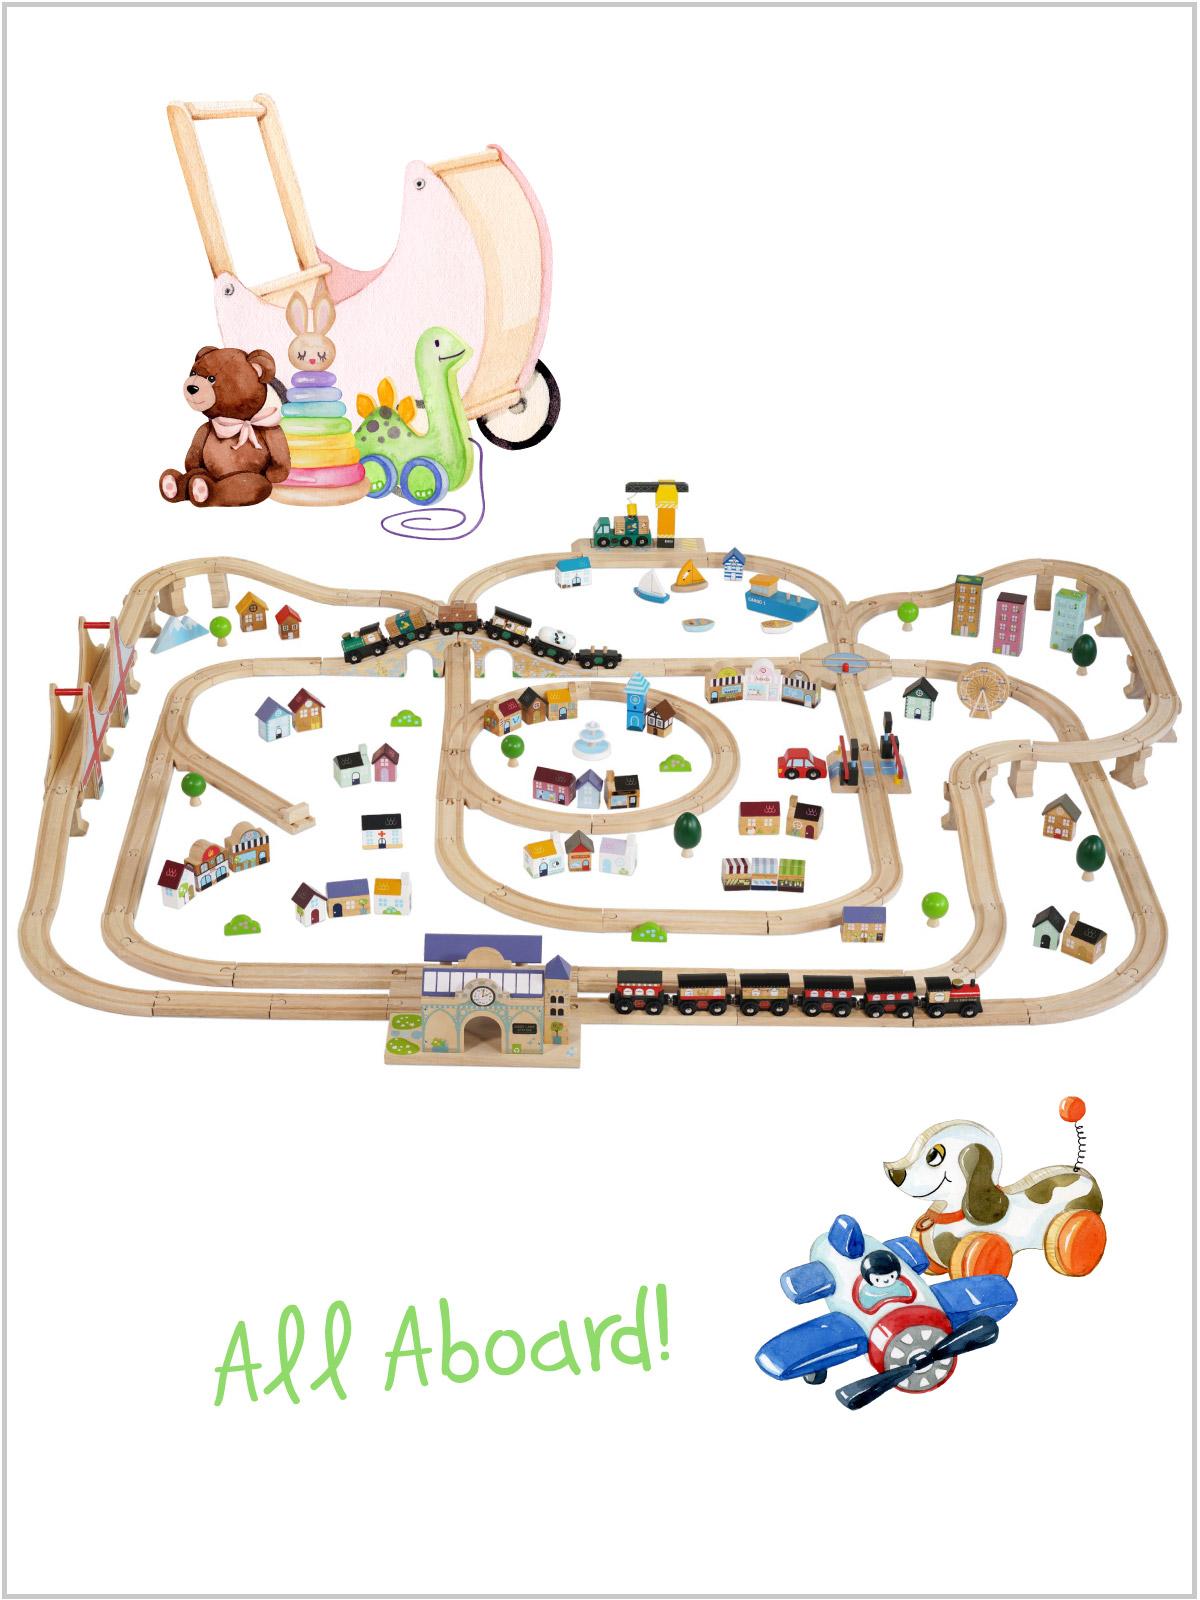 frederickandsophie-kids-toys-train_set-royal-express-train-wooden-letoyvan